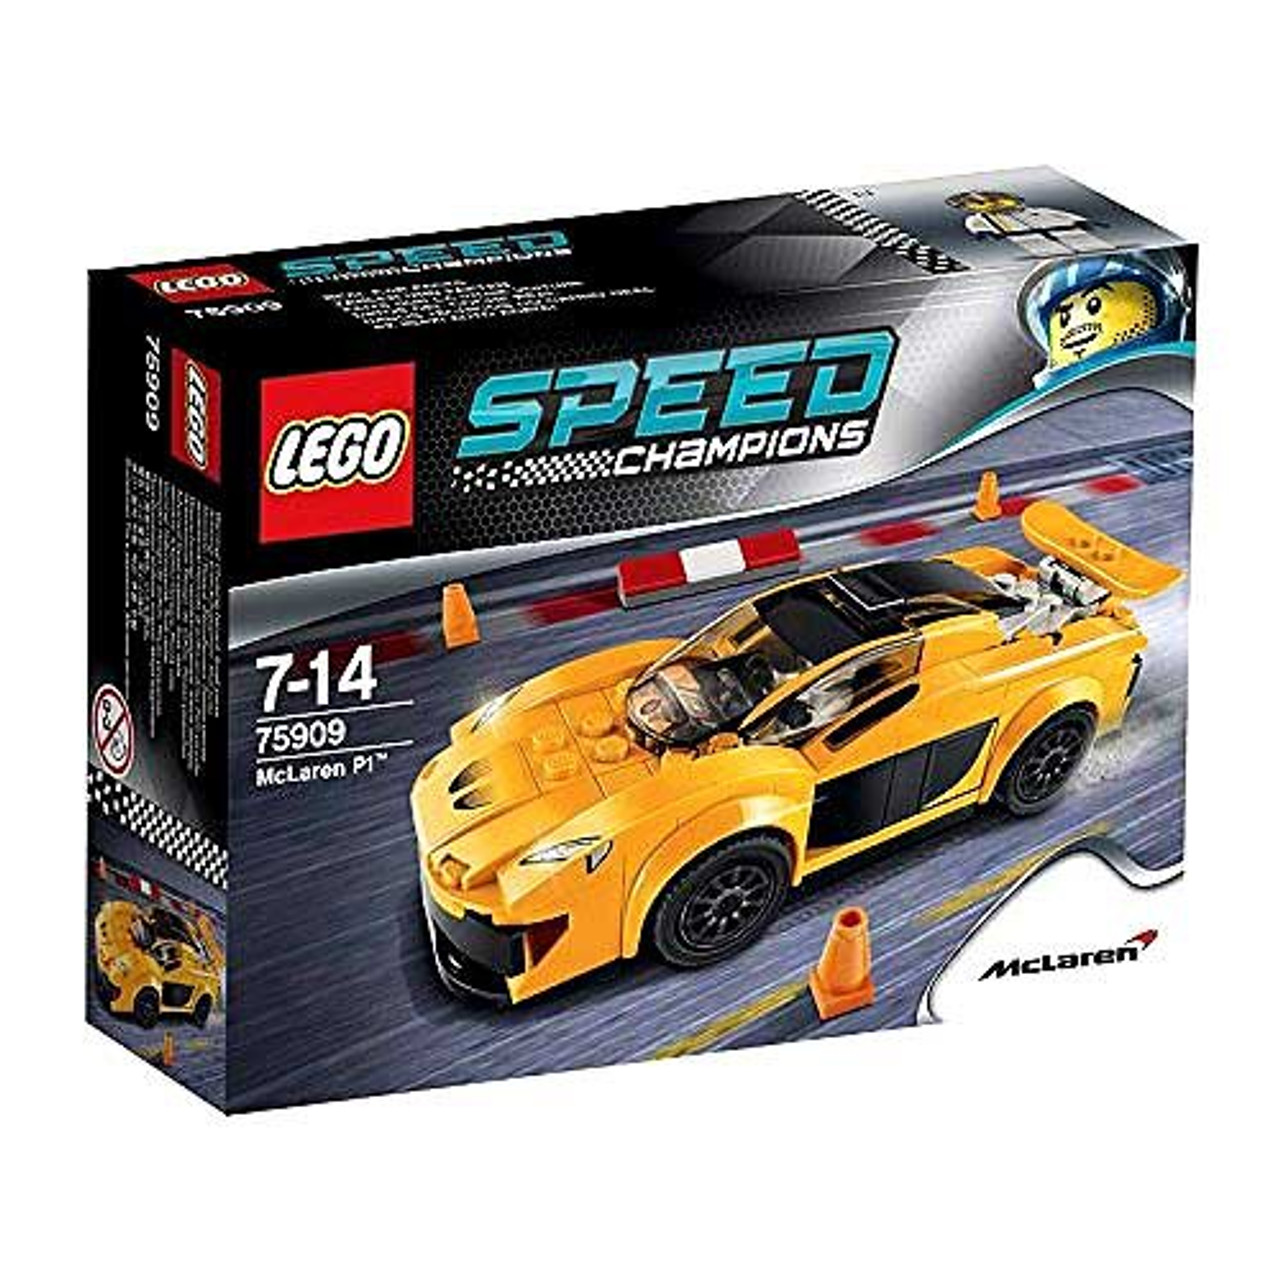 LEGO Speed Champions McLaren P1 Set #75909